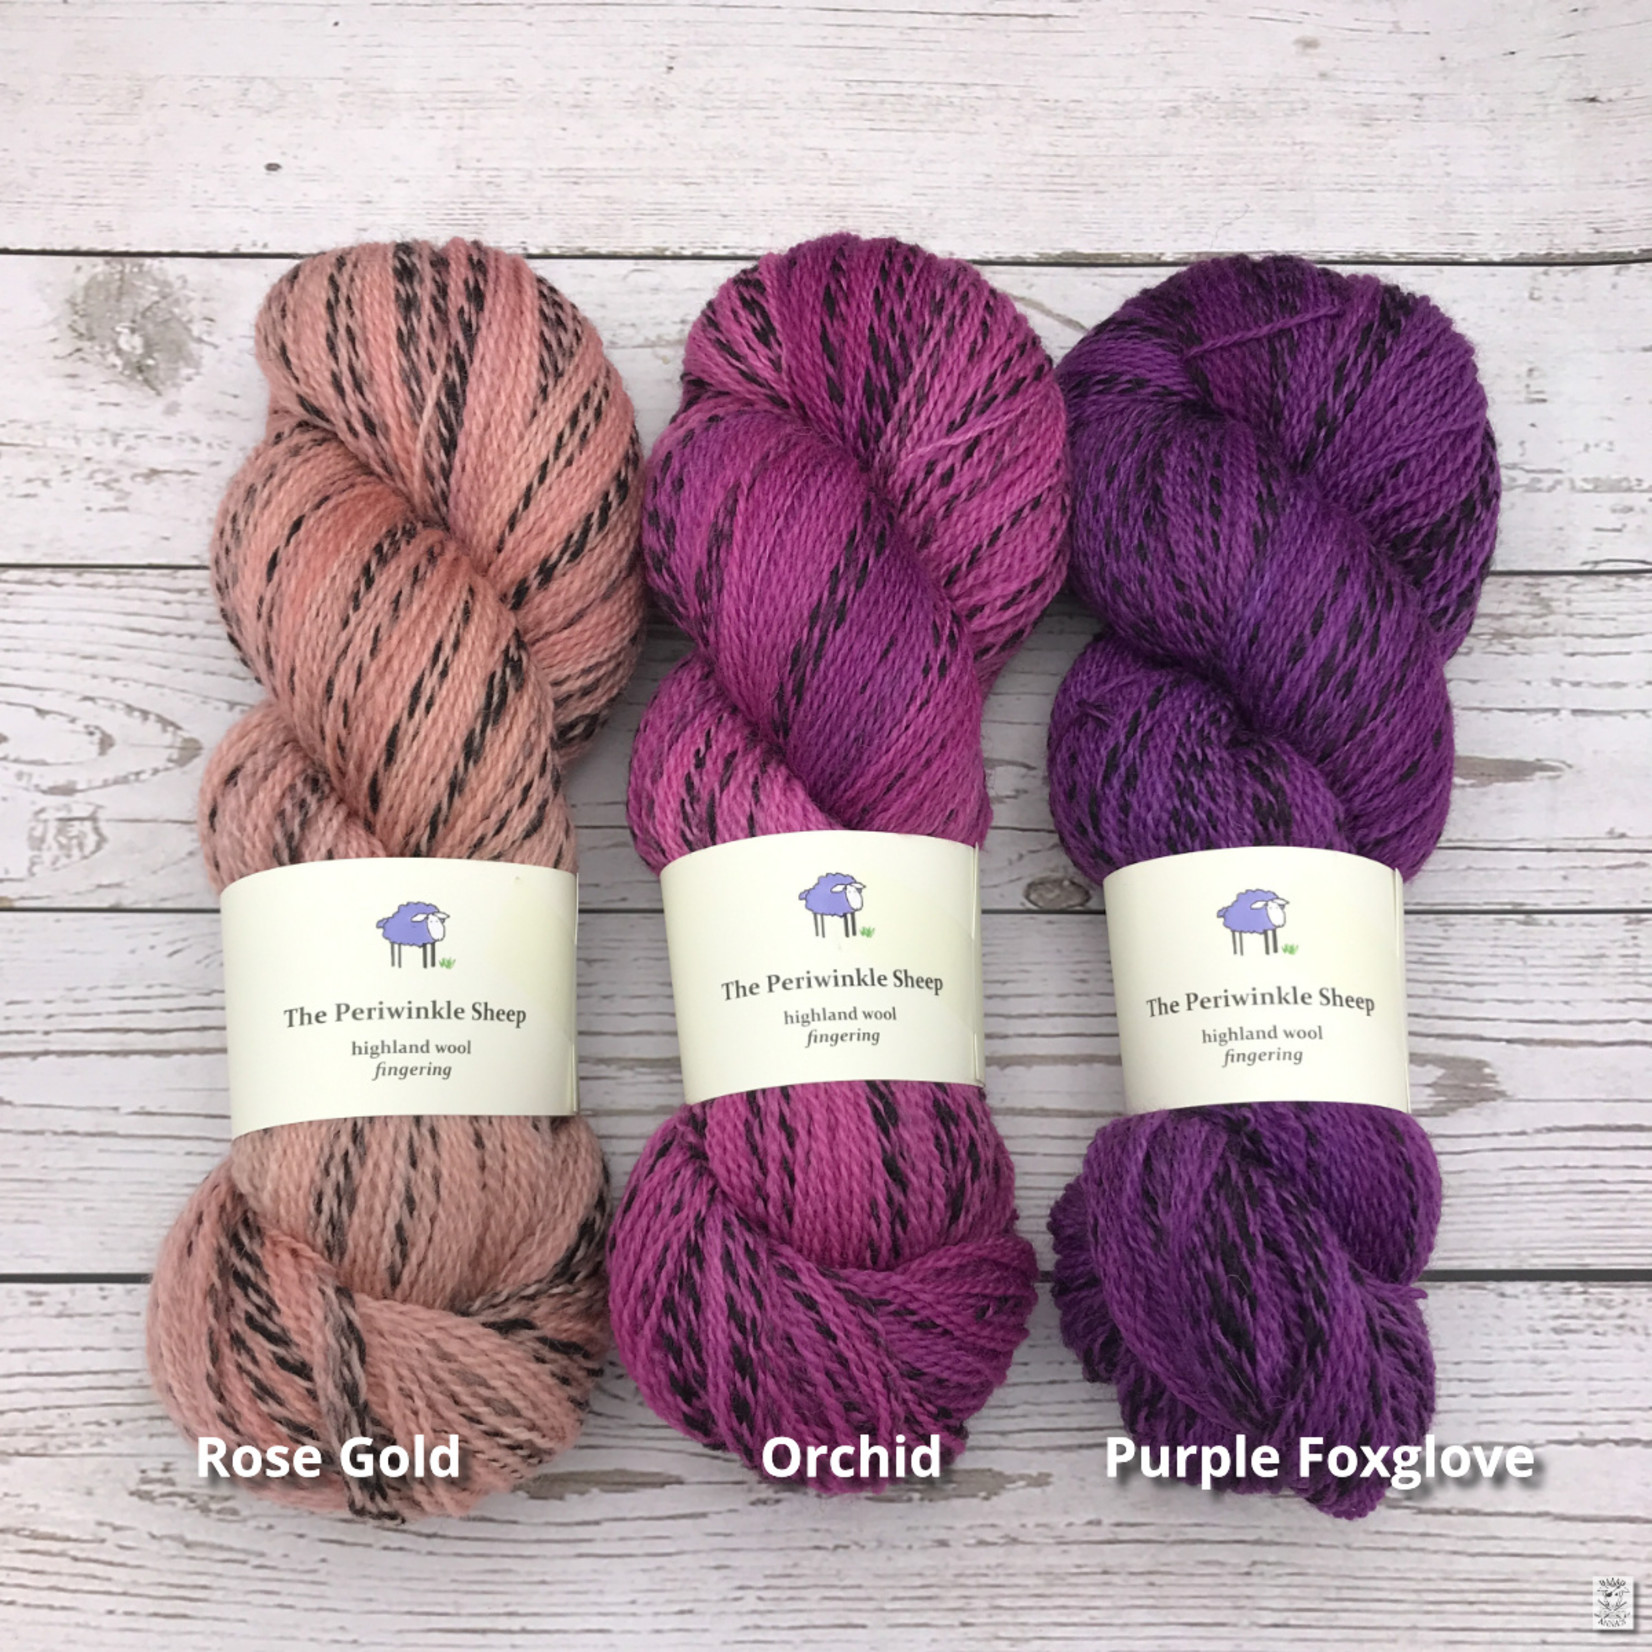 Periwinkle Sheep Periwinkle Sheep Highland Wool Fingering